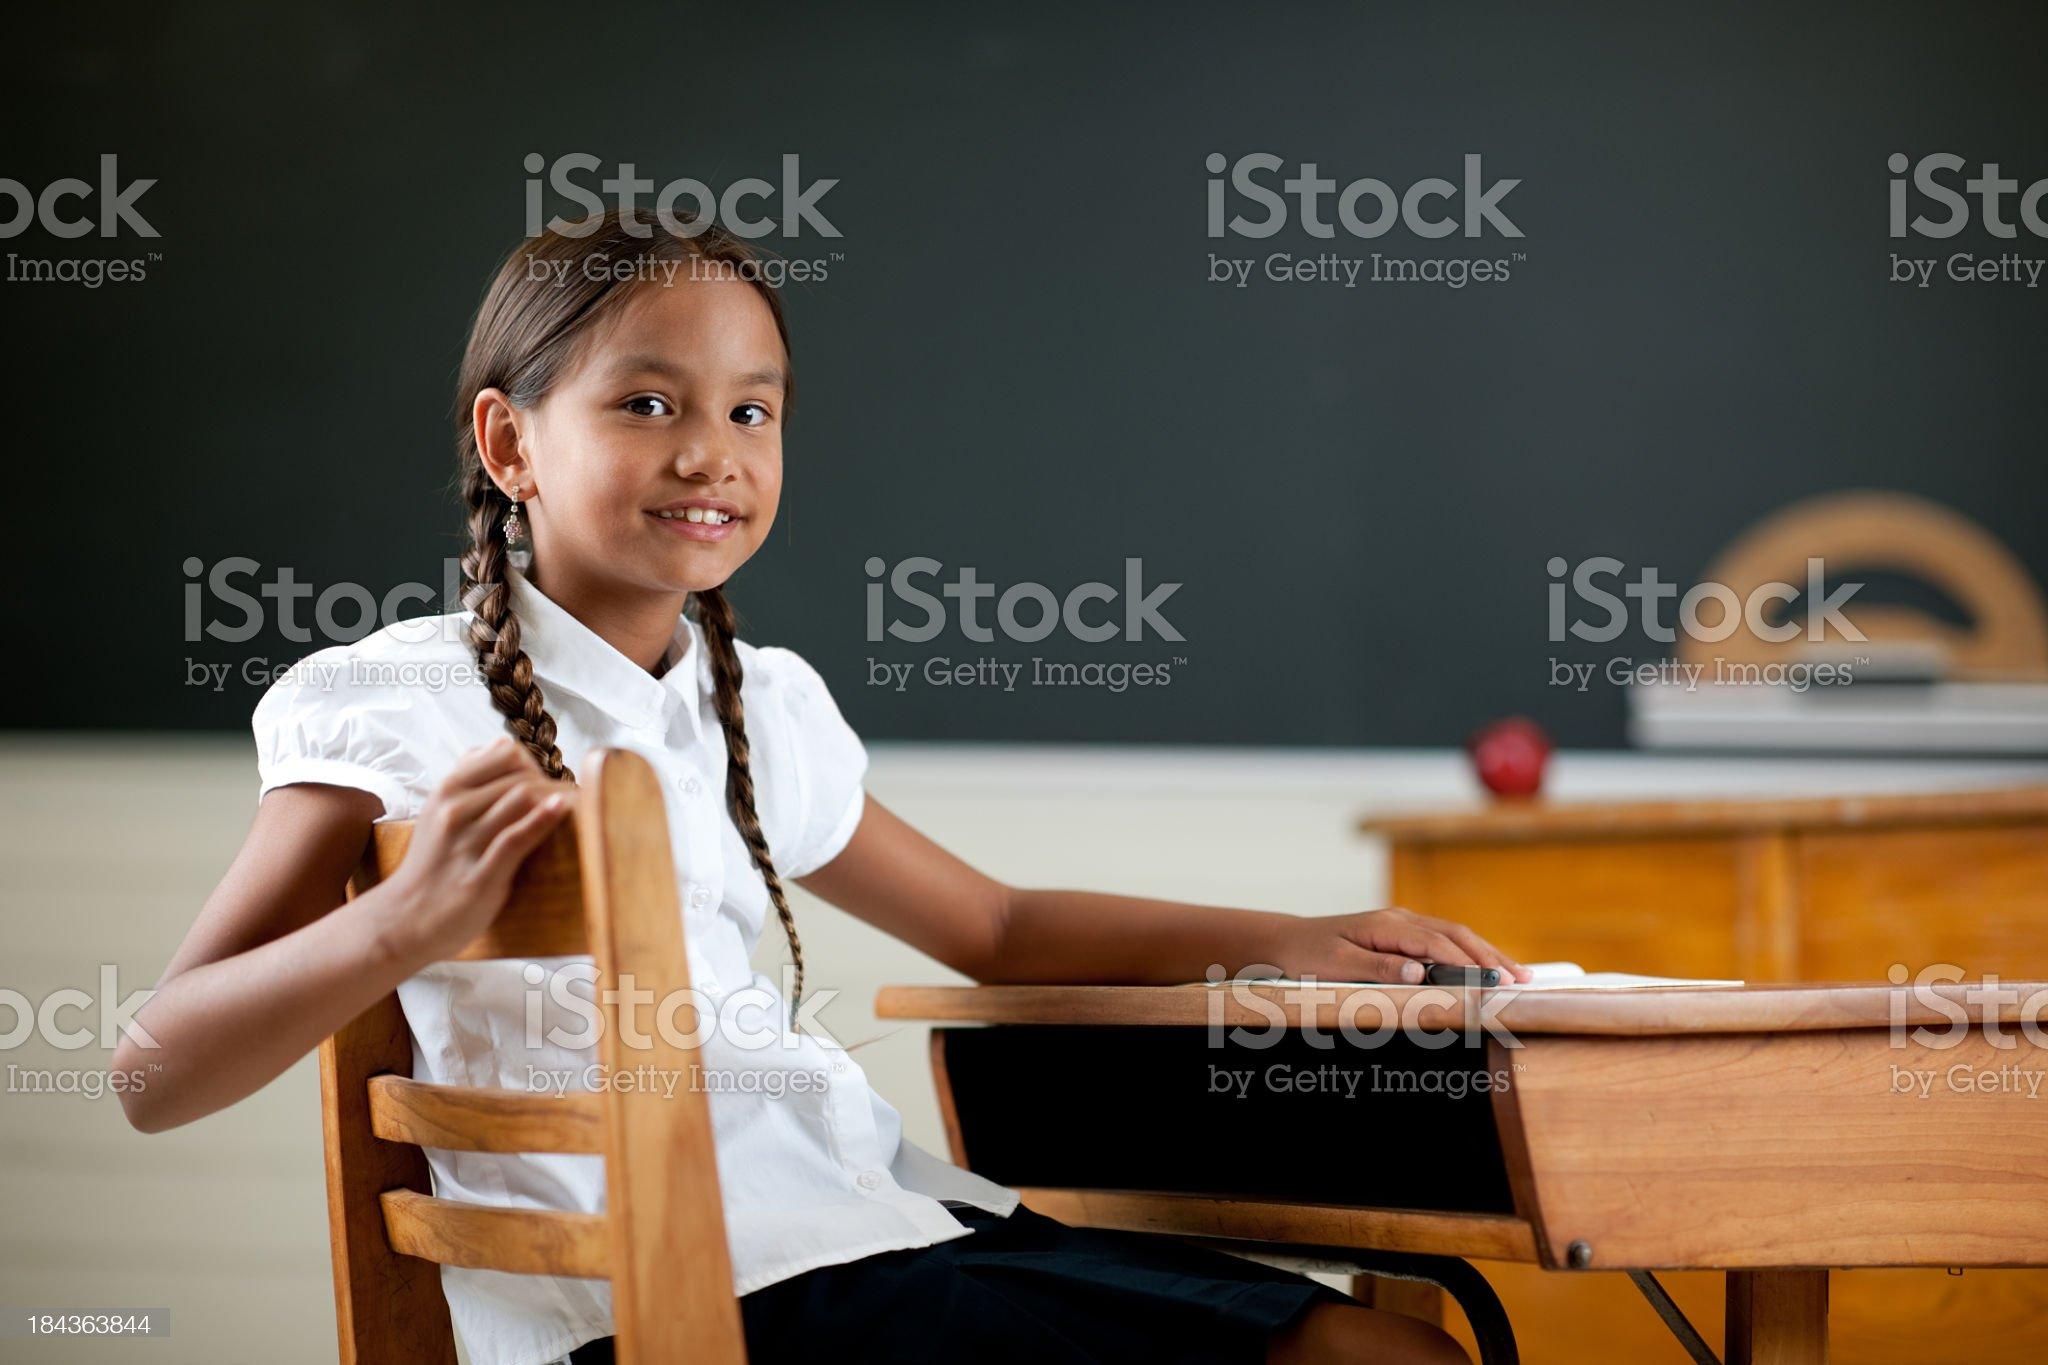 Student royalty-free stock photo